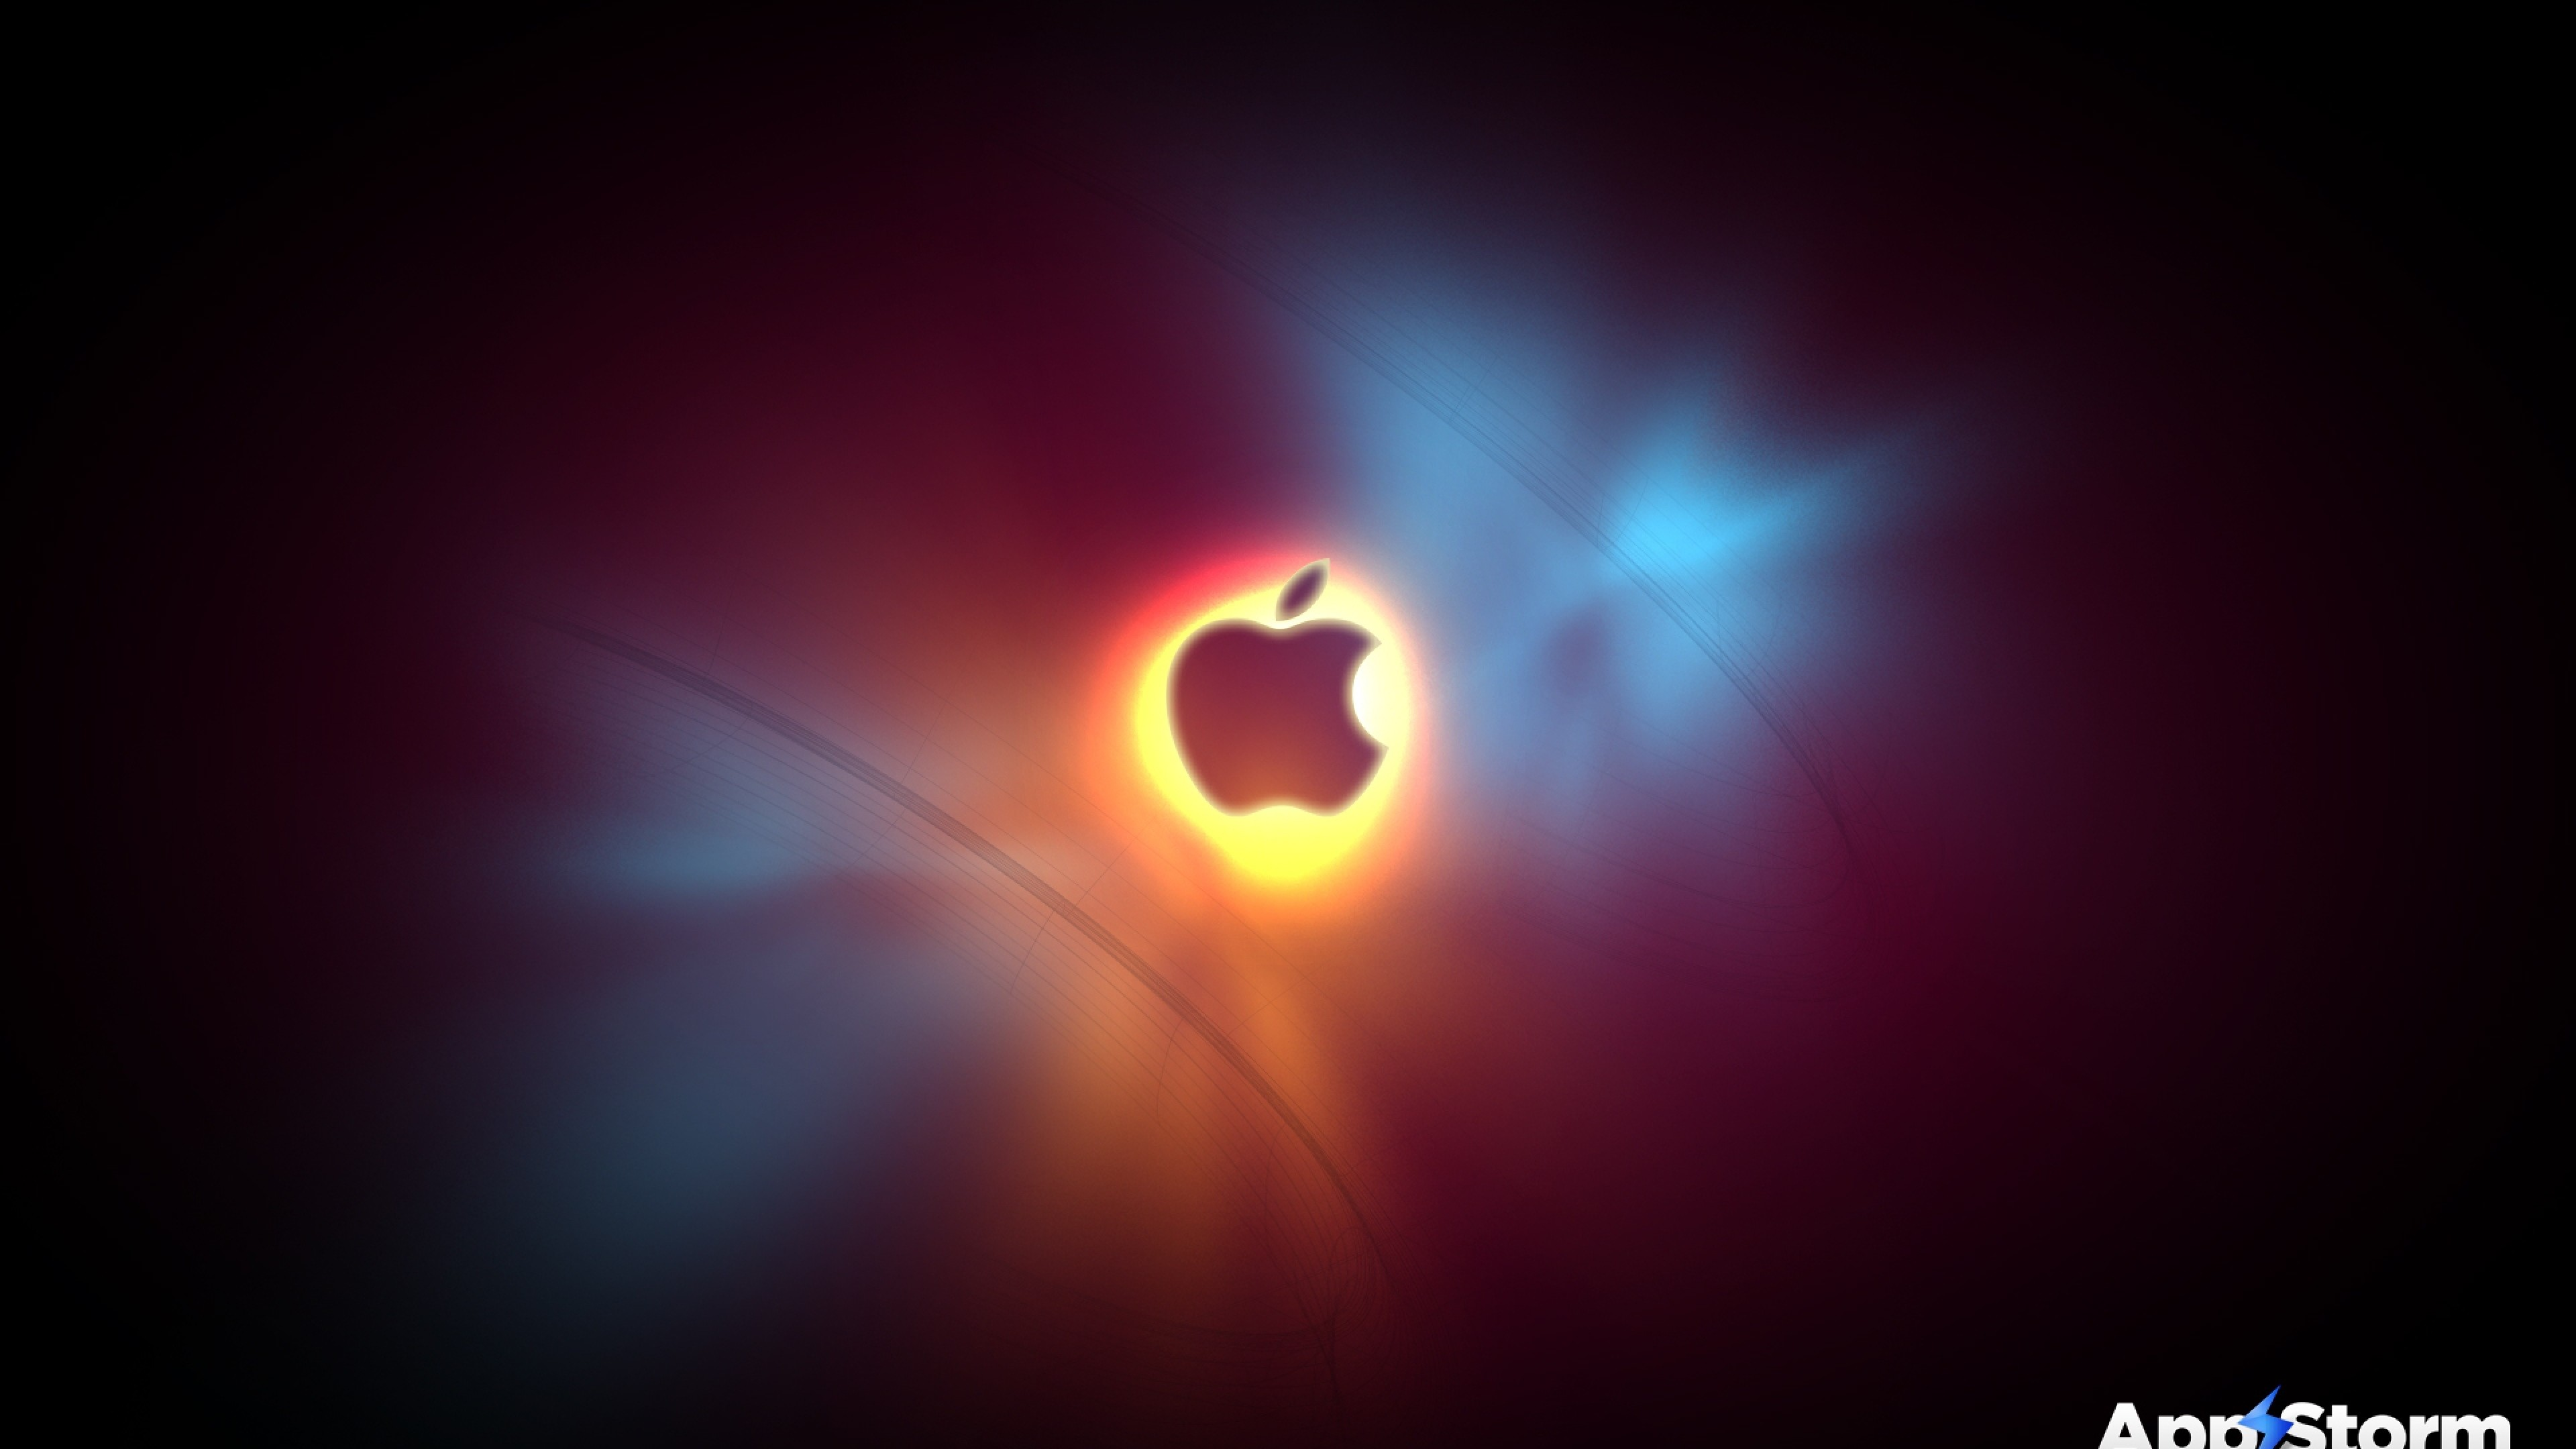 Wallpaper app storm, apple, mac, light, smoke, flash